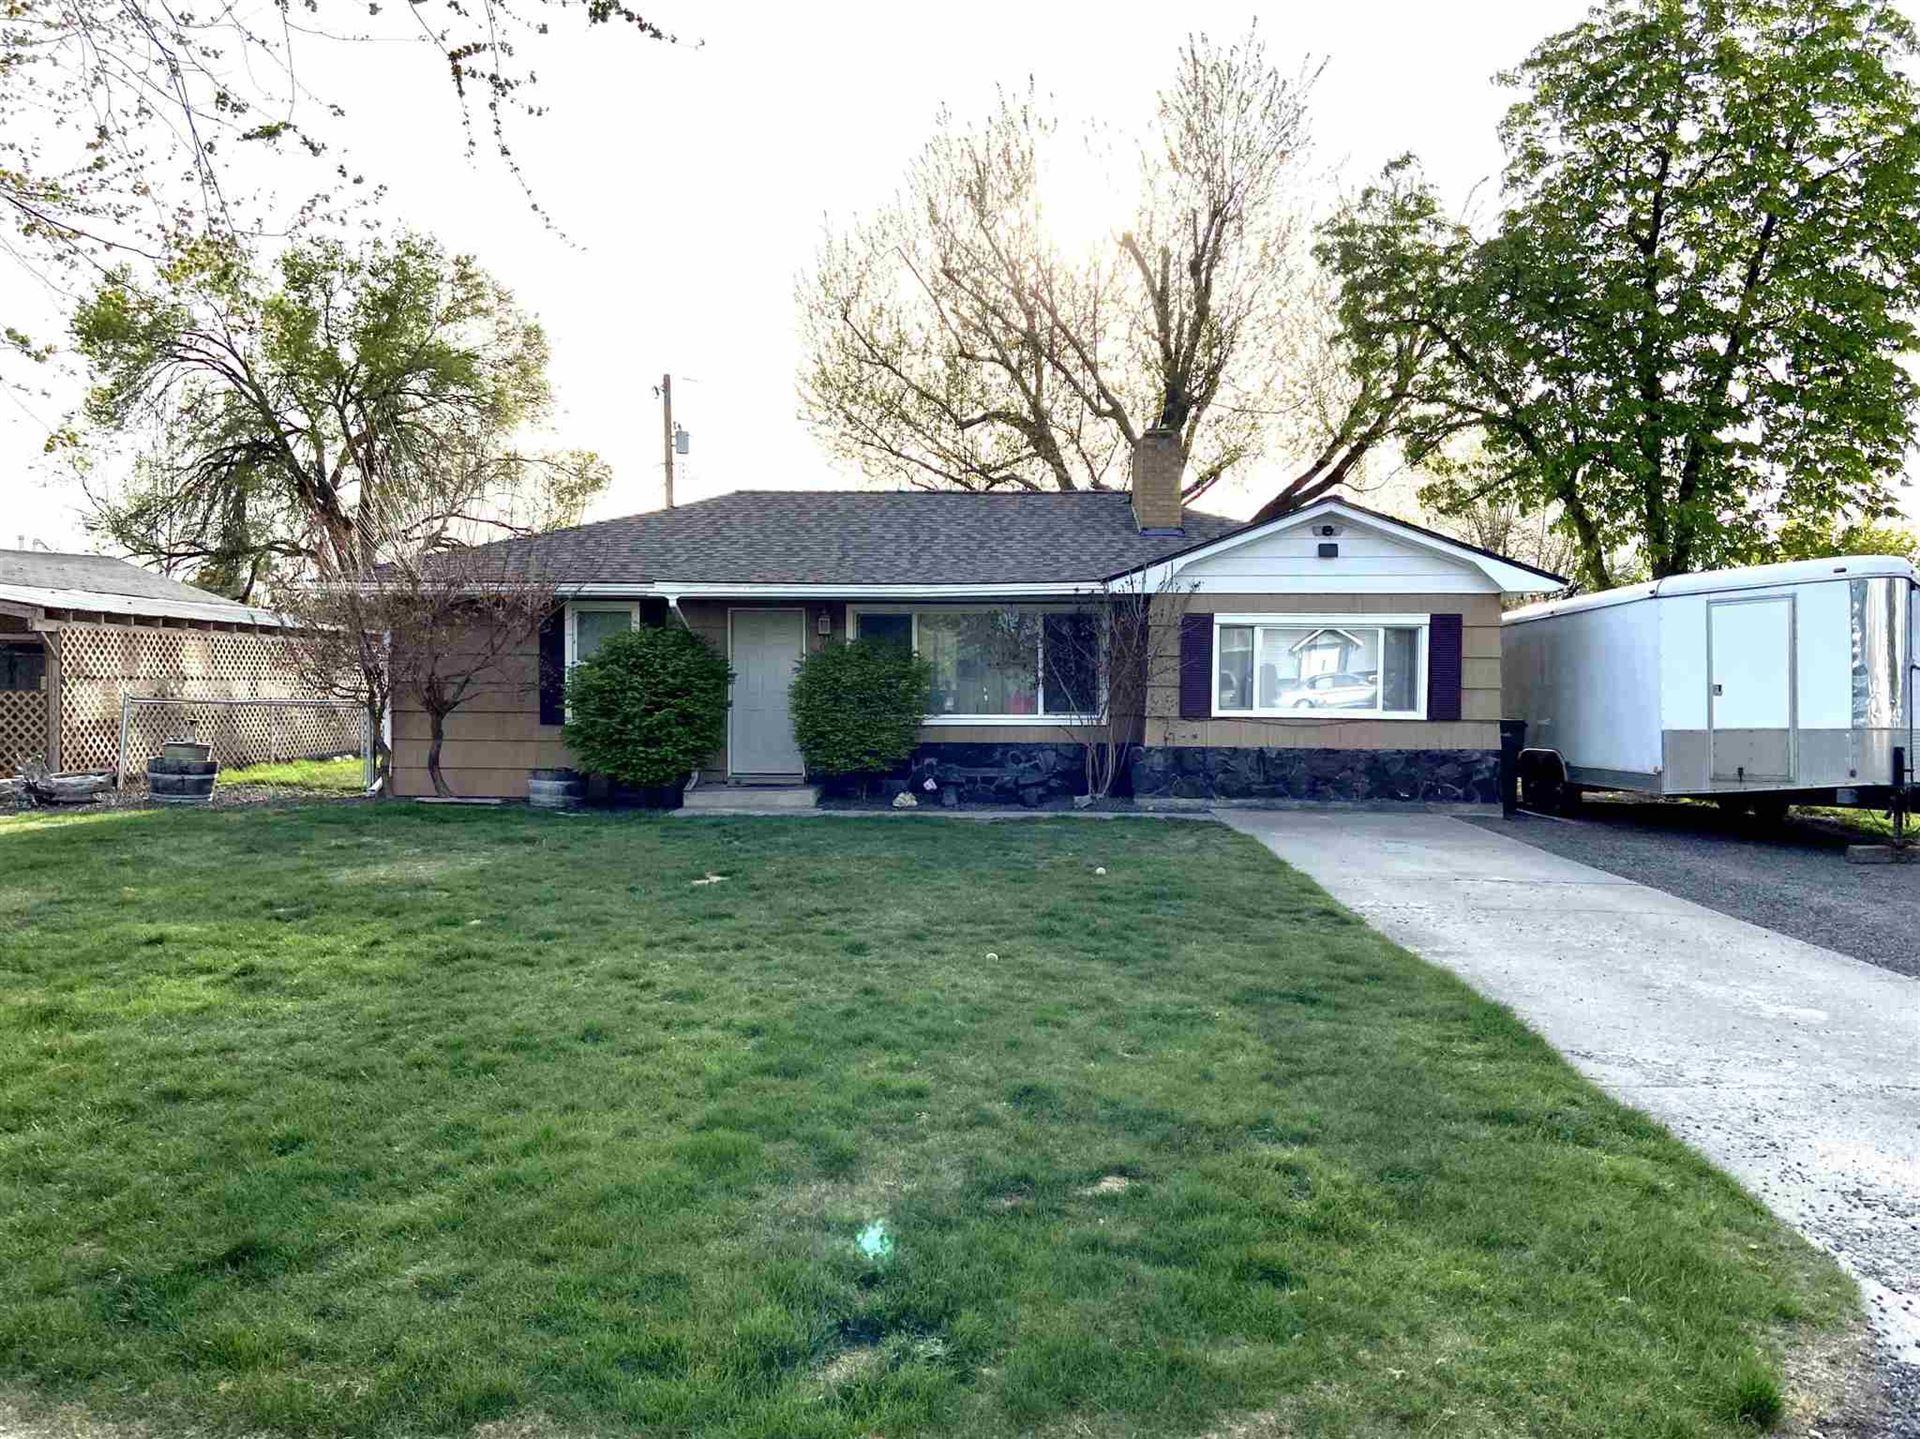 1817 N Ely Rd, Spokane, WA 99212 - #: 202114602